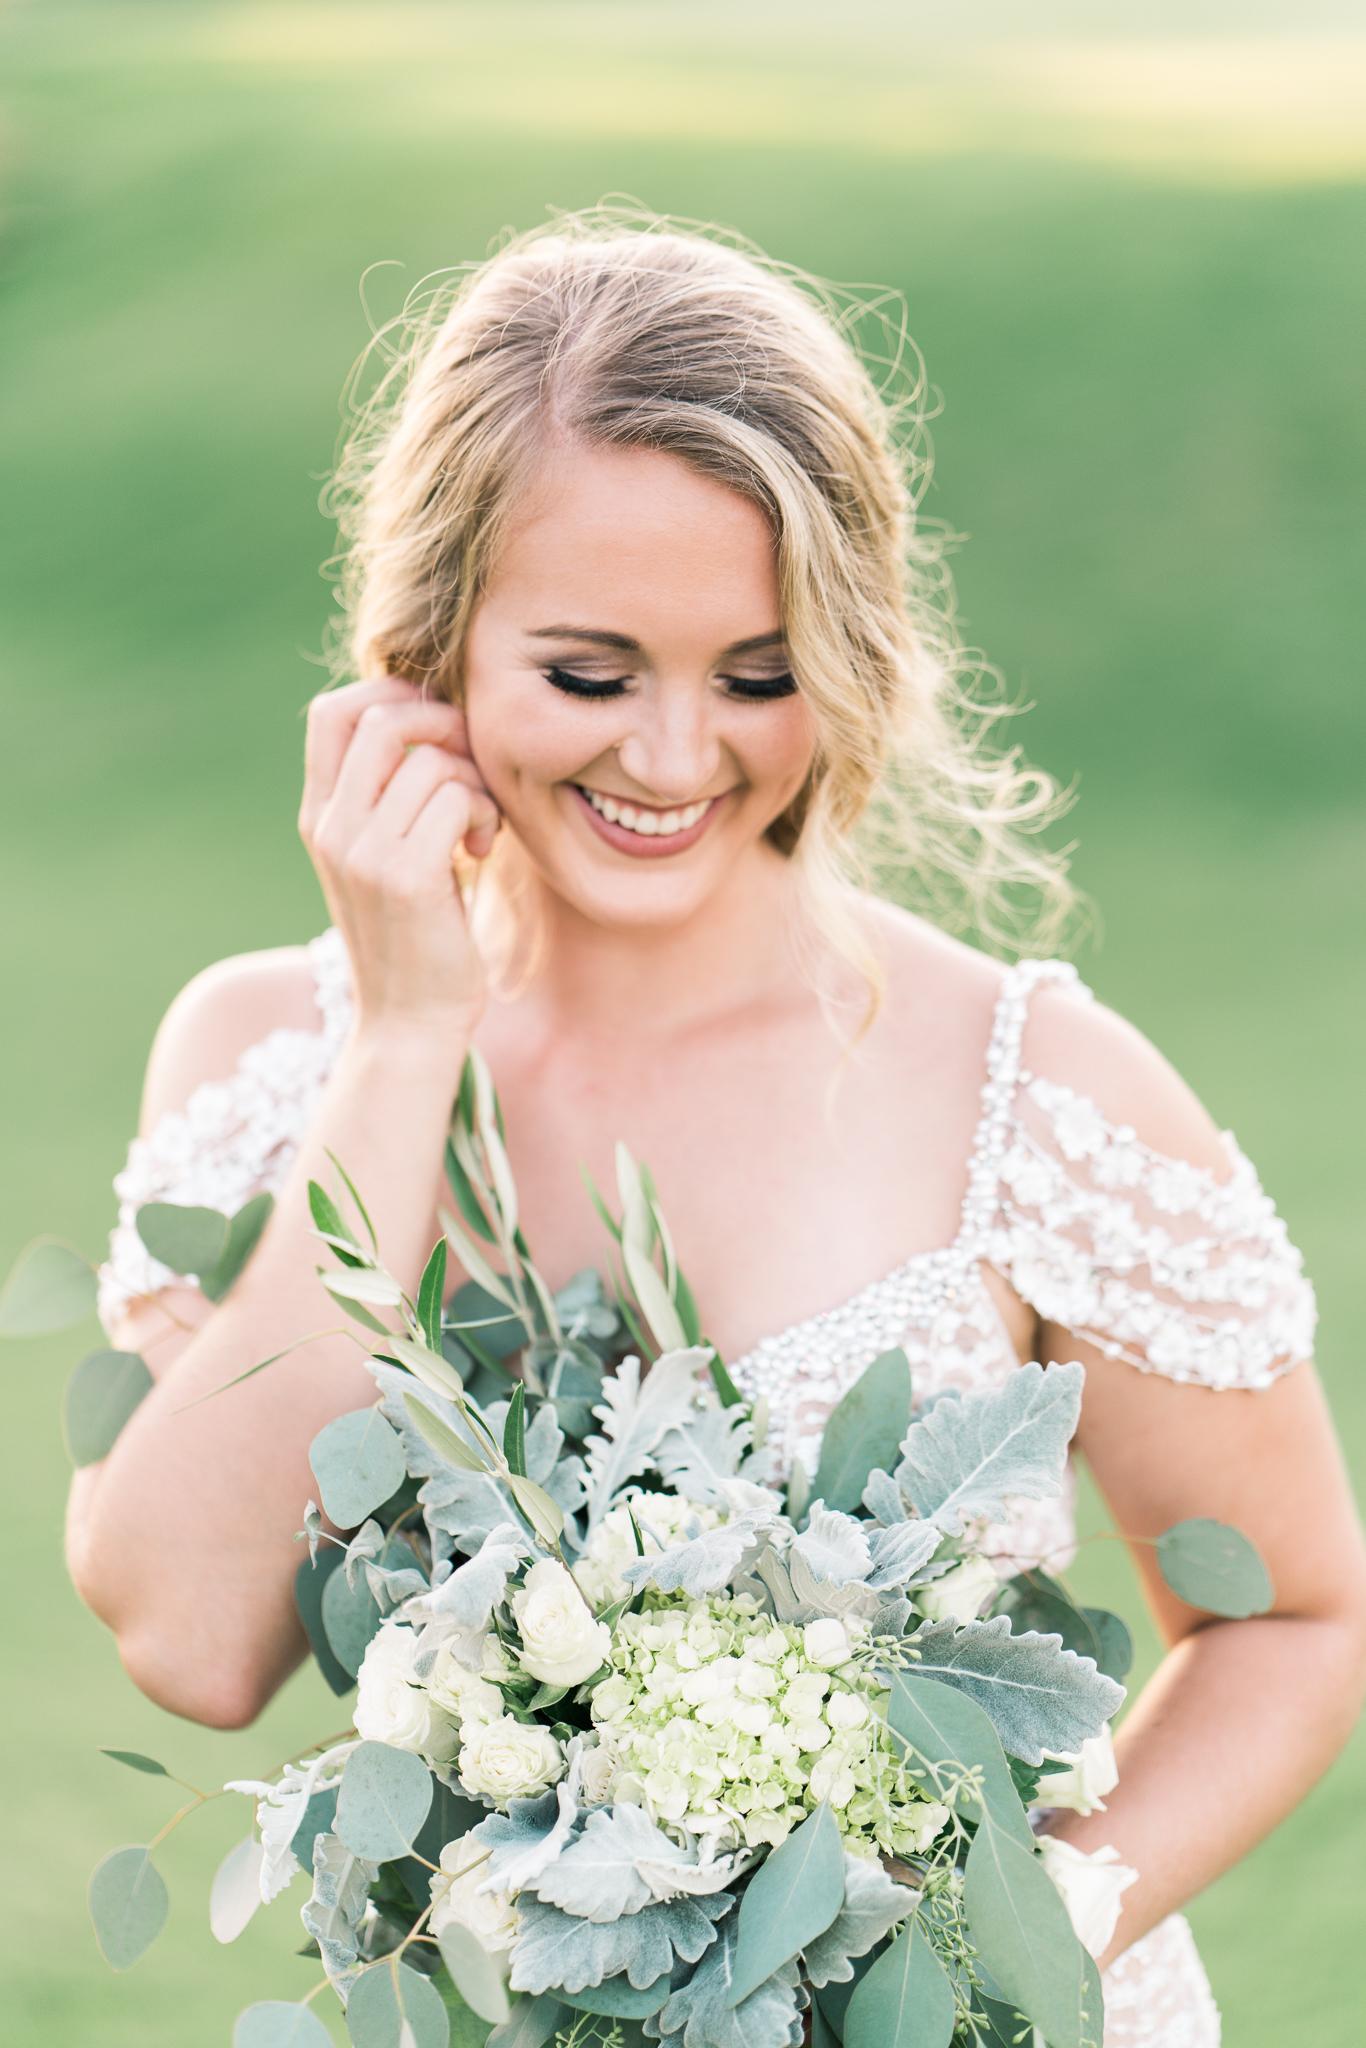 Clytee-Bridal-Portraits-Web-53.jpg